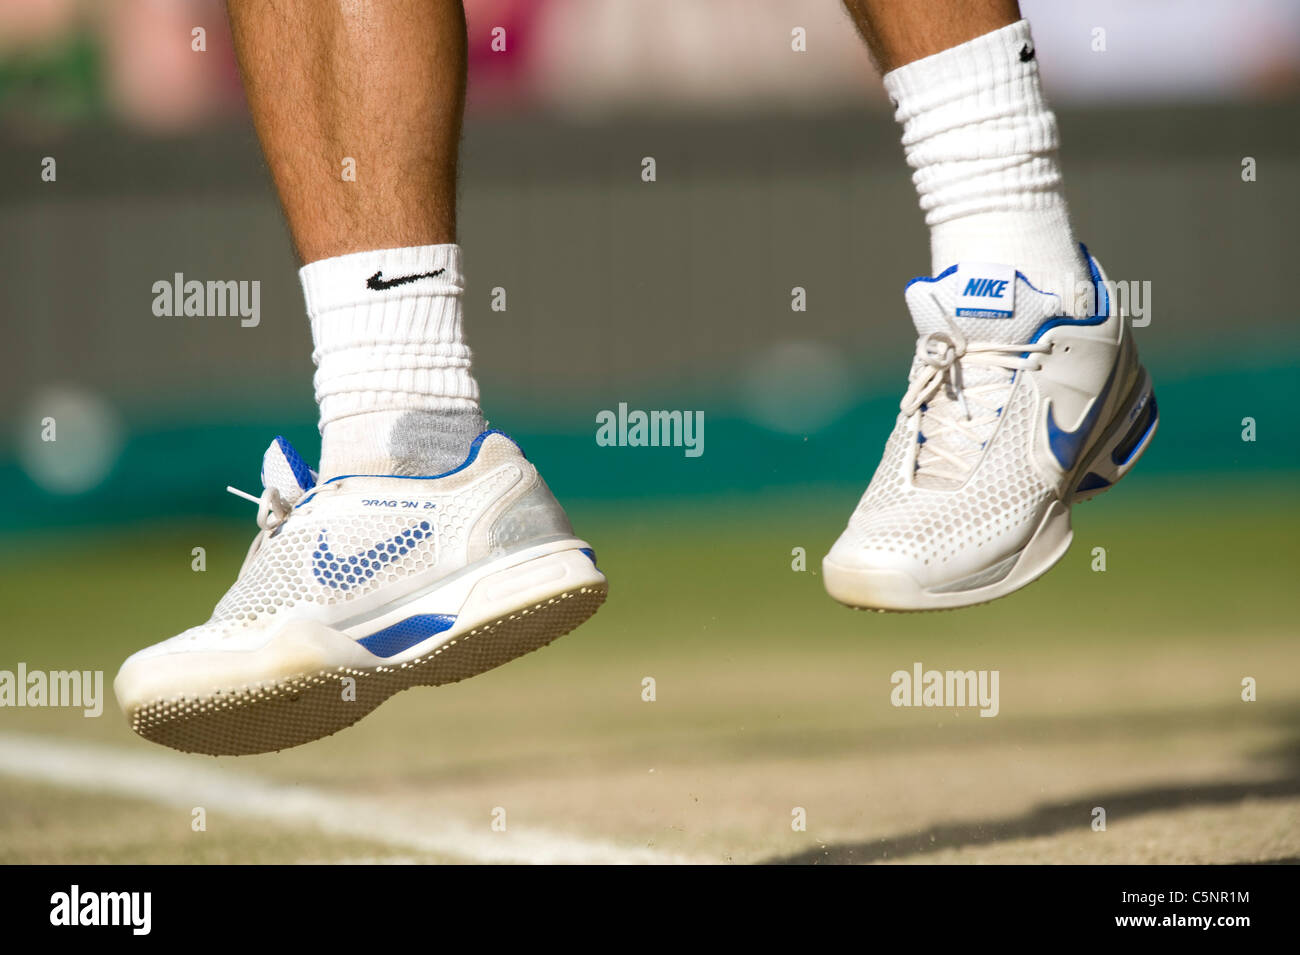 Rafael Nadal Esp Shoe Detail While Serving During The Wimbledon Stock Photo Alamy